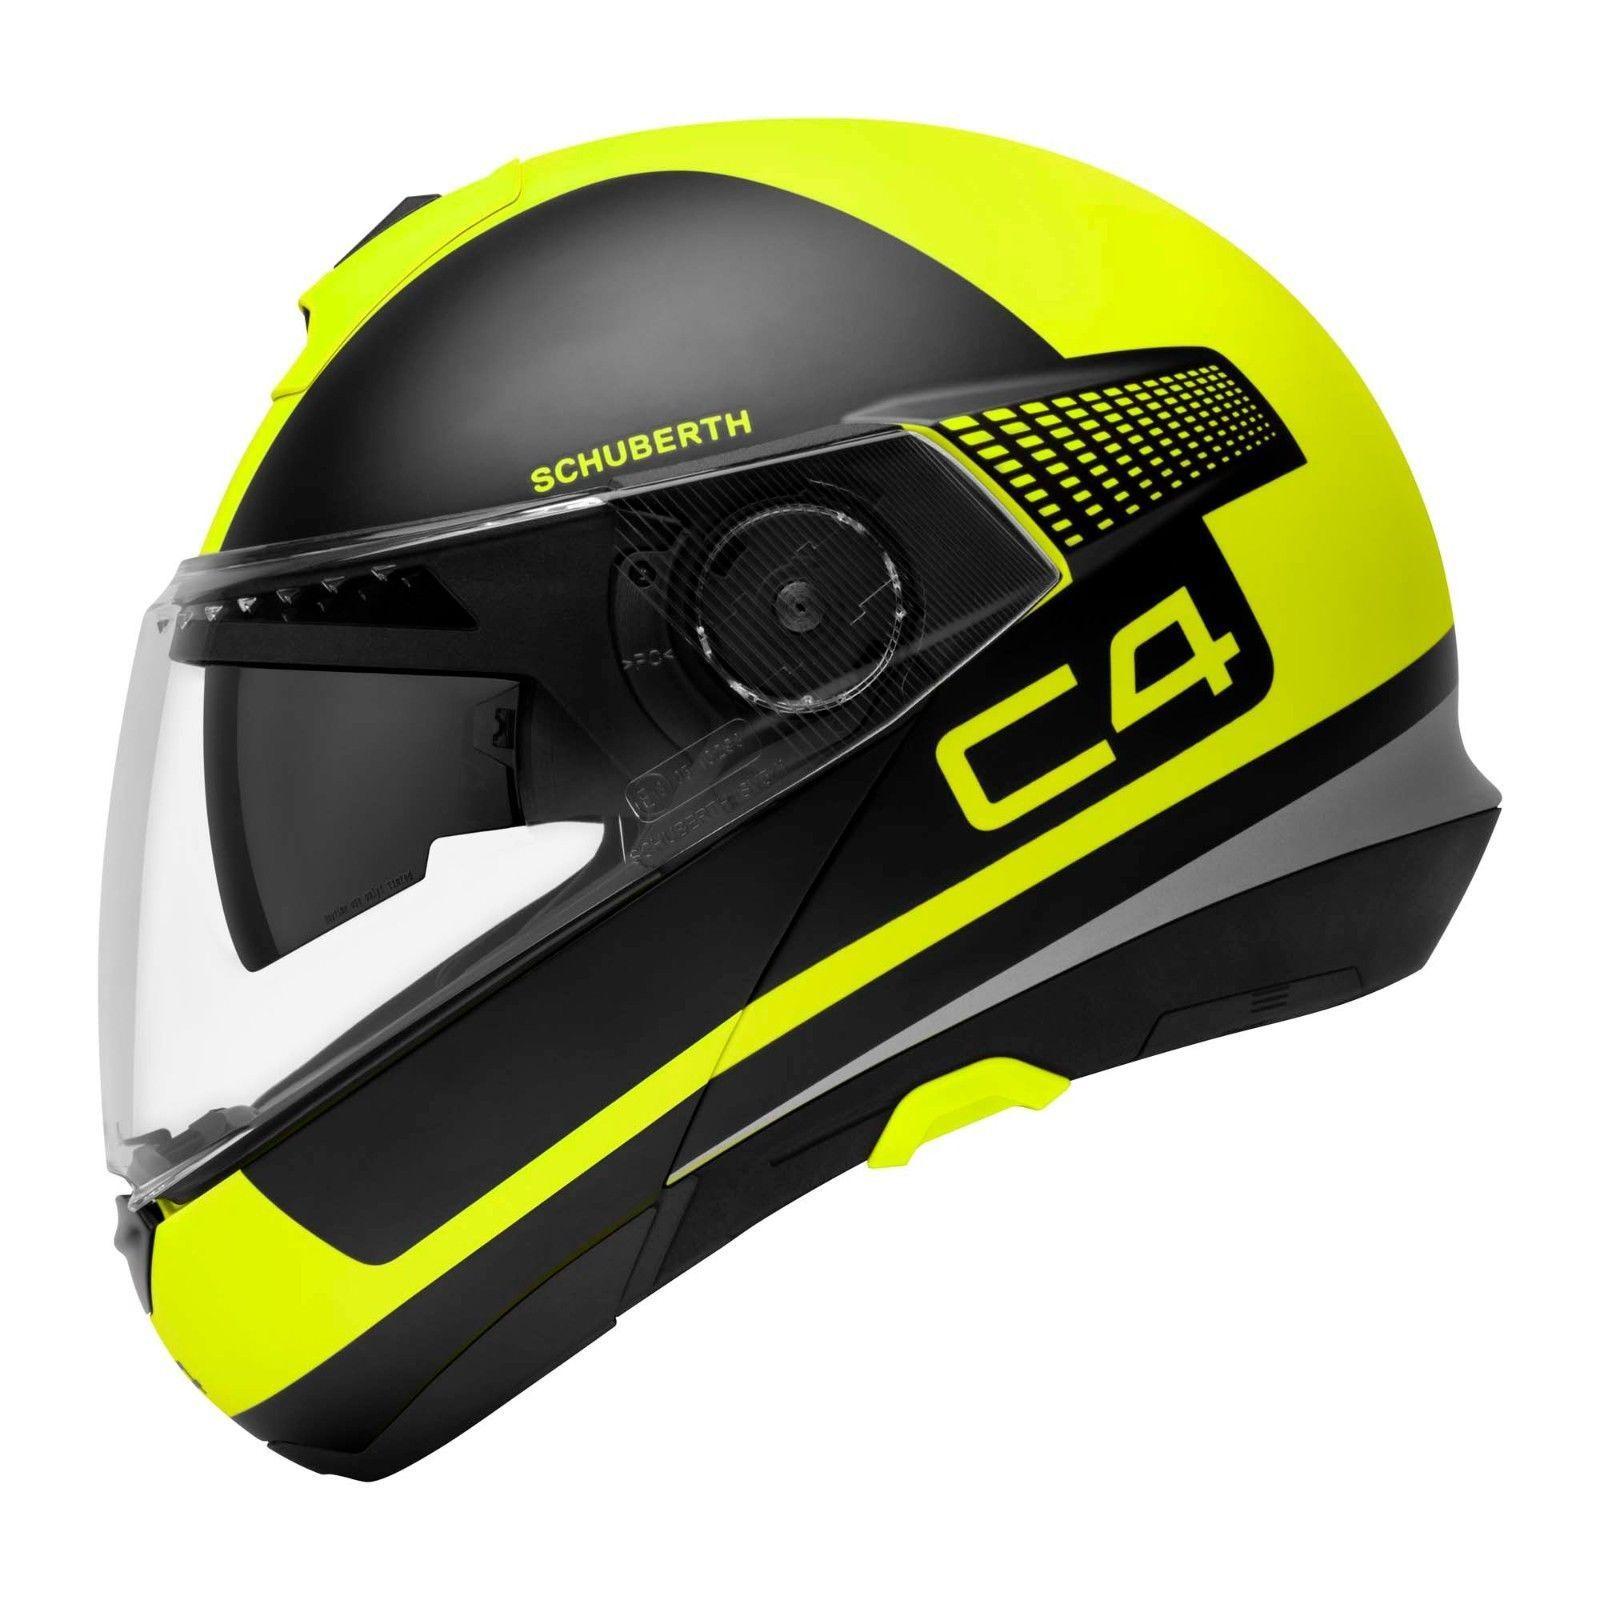 Capacete Schuberth C4 Legacy Black Yellow - C-4